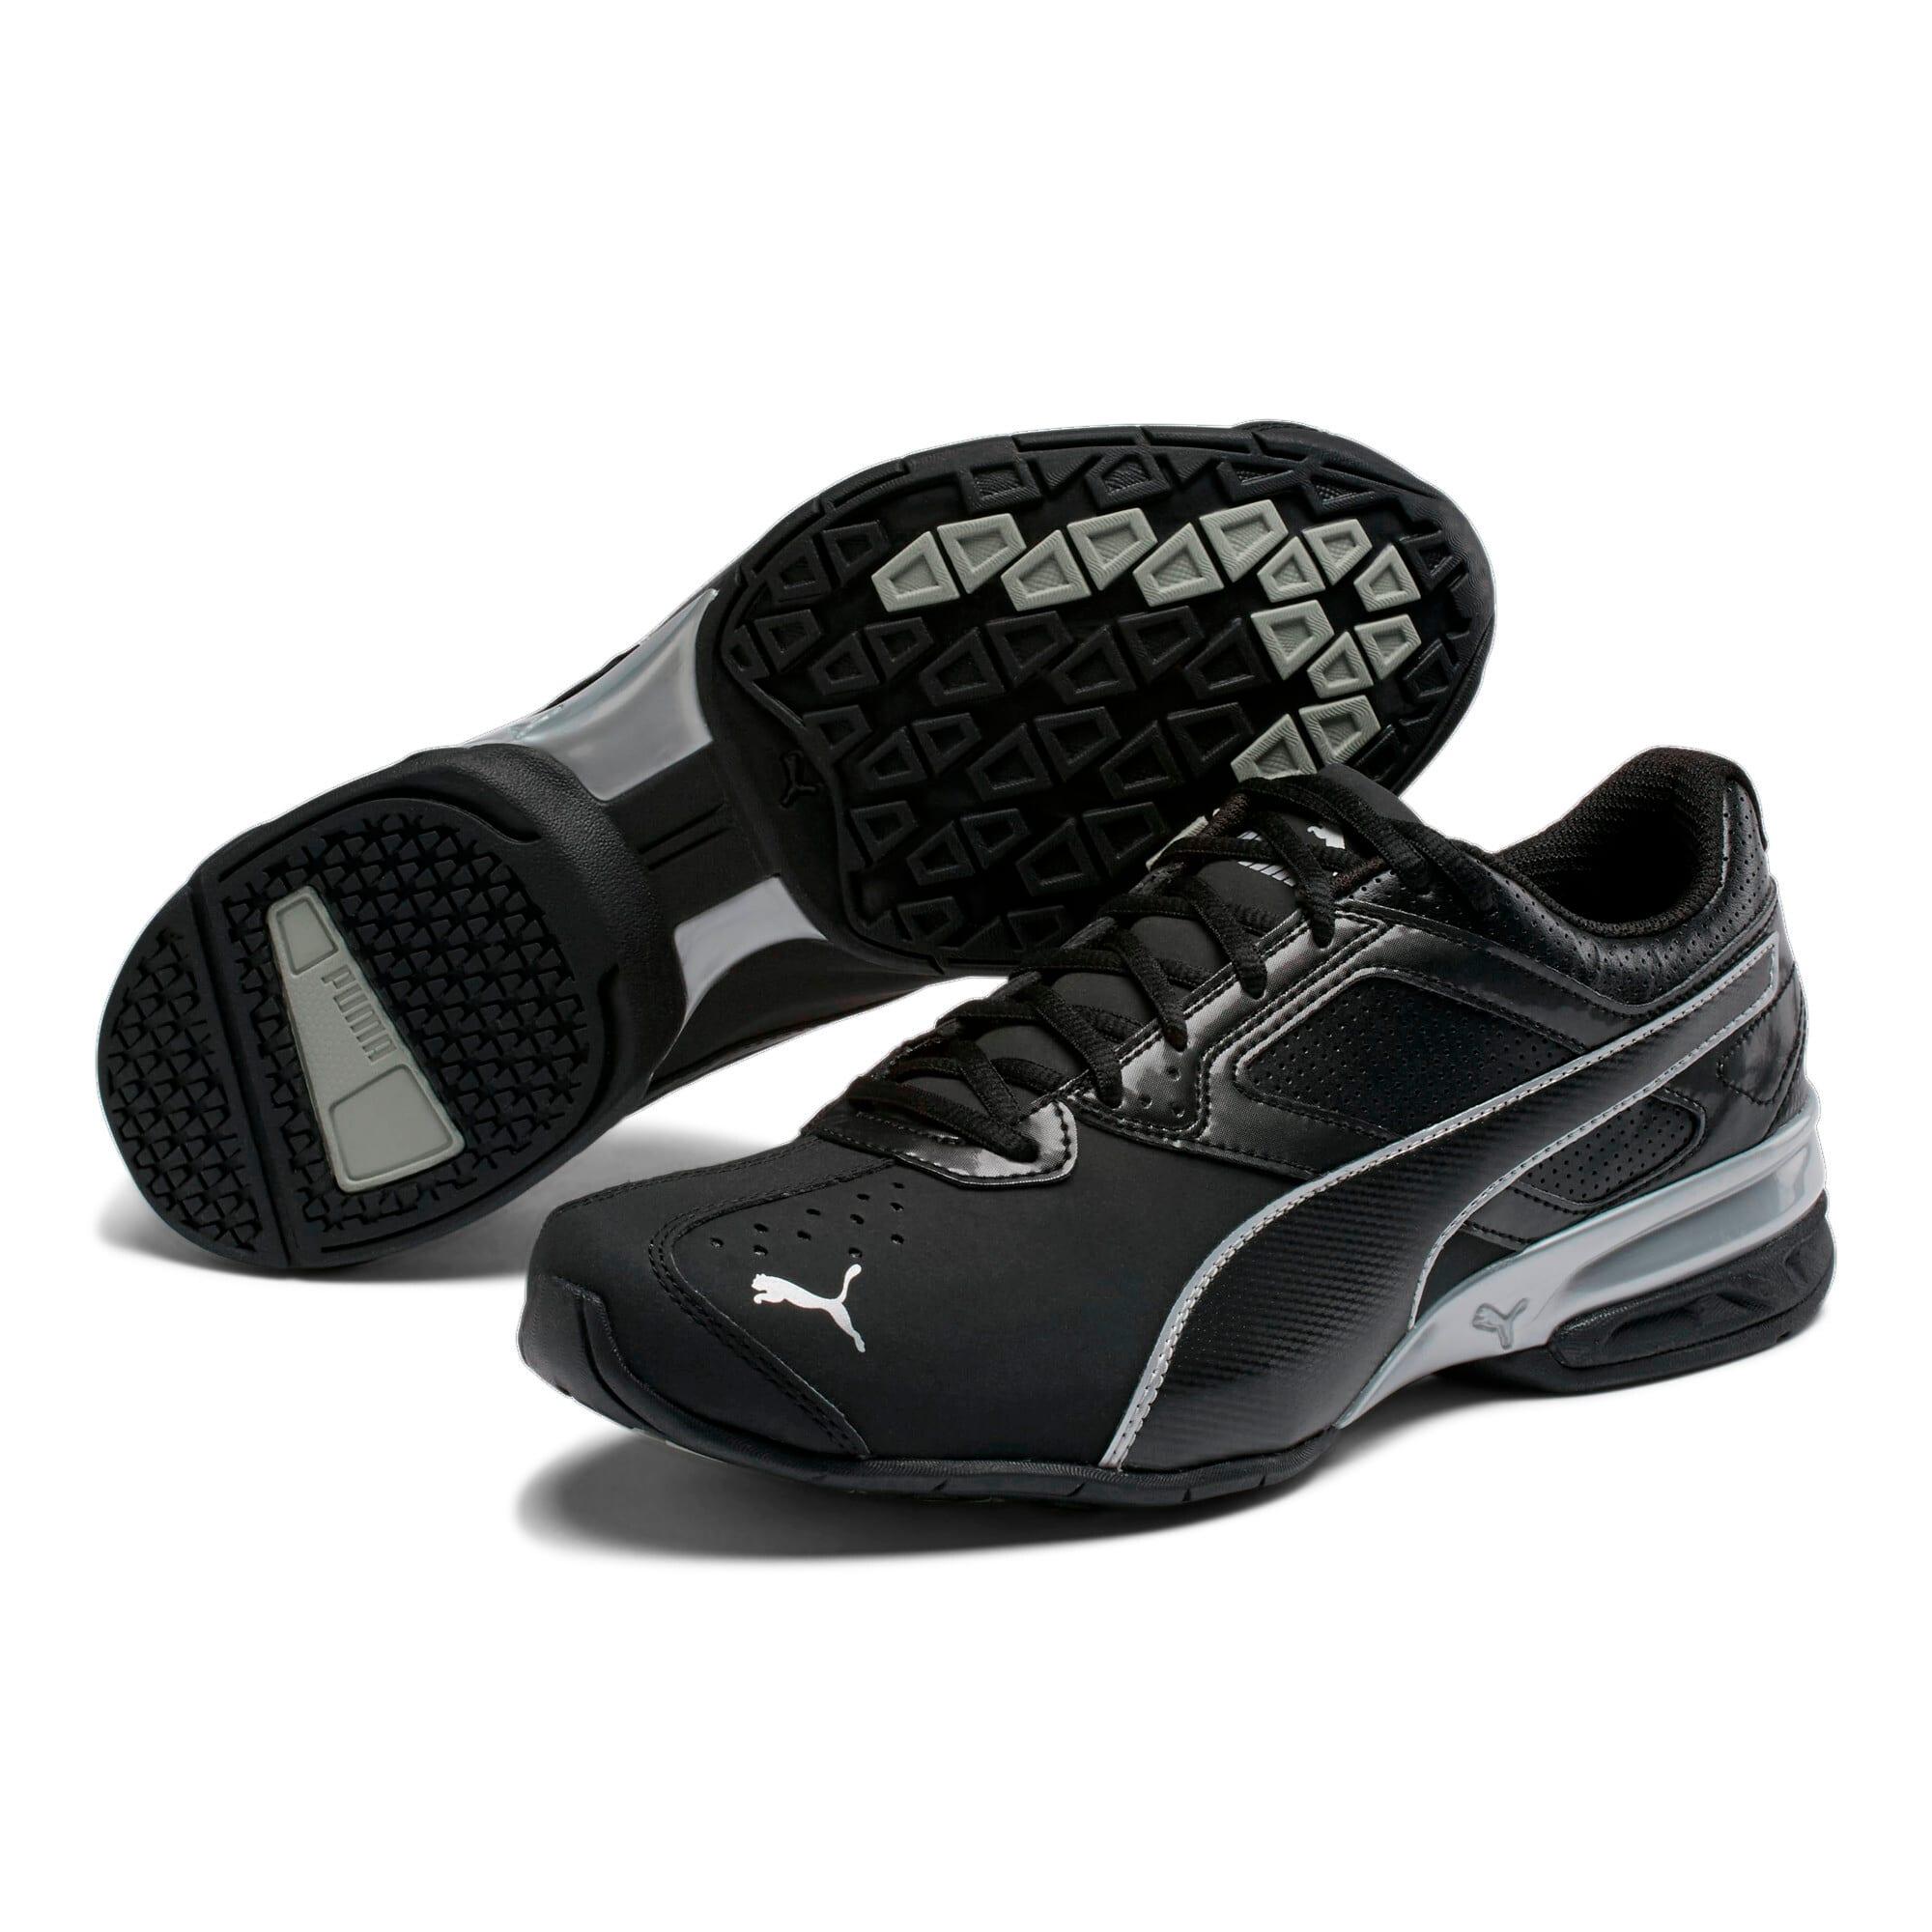 Thumbnail 2 of Tazon 6 FM Men's Sneakers, Puma Black-puma silver, medium